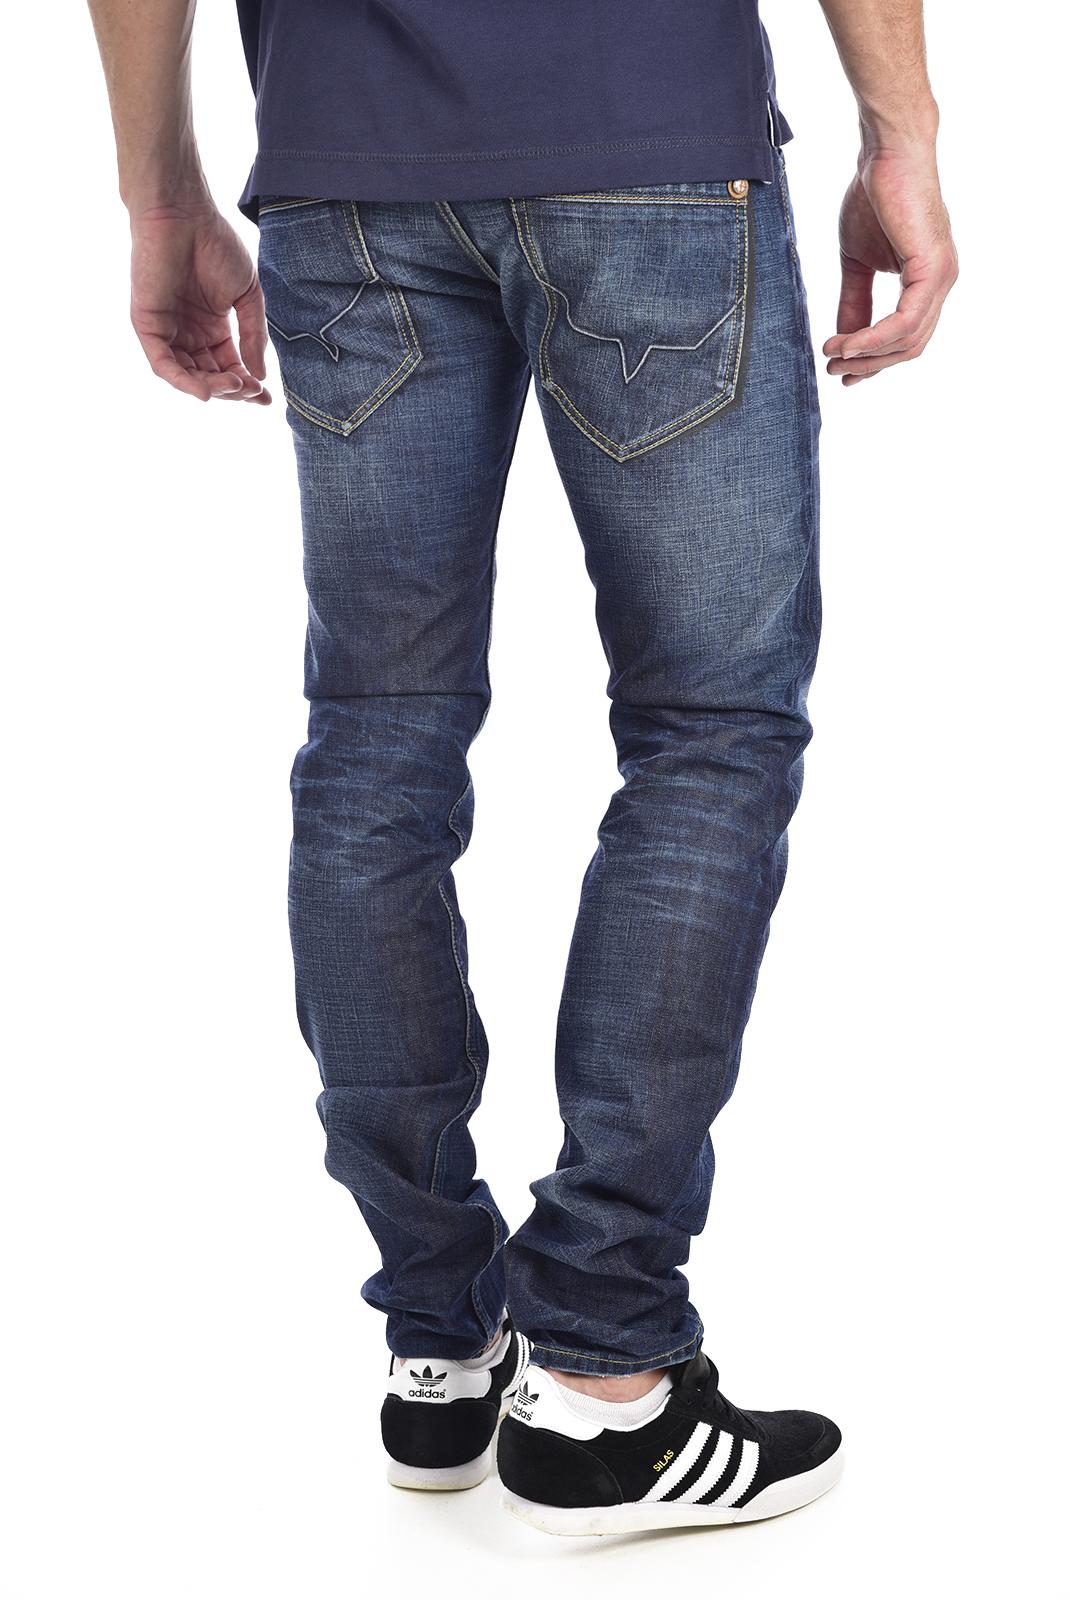 Jeans  Pepe jeans PM200983W124 colville bleu